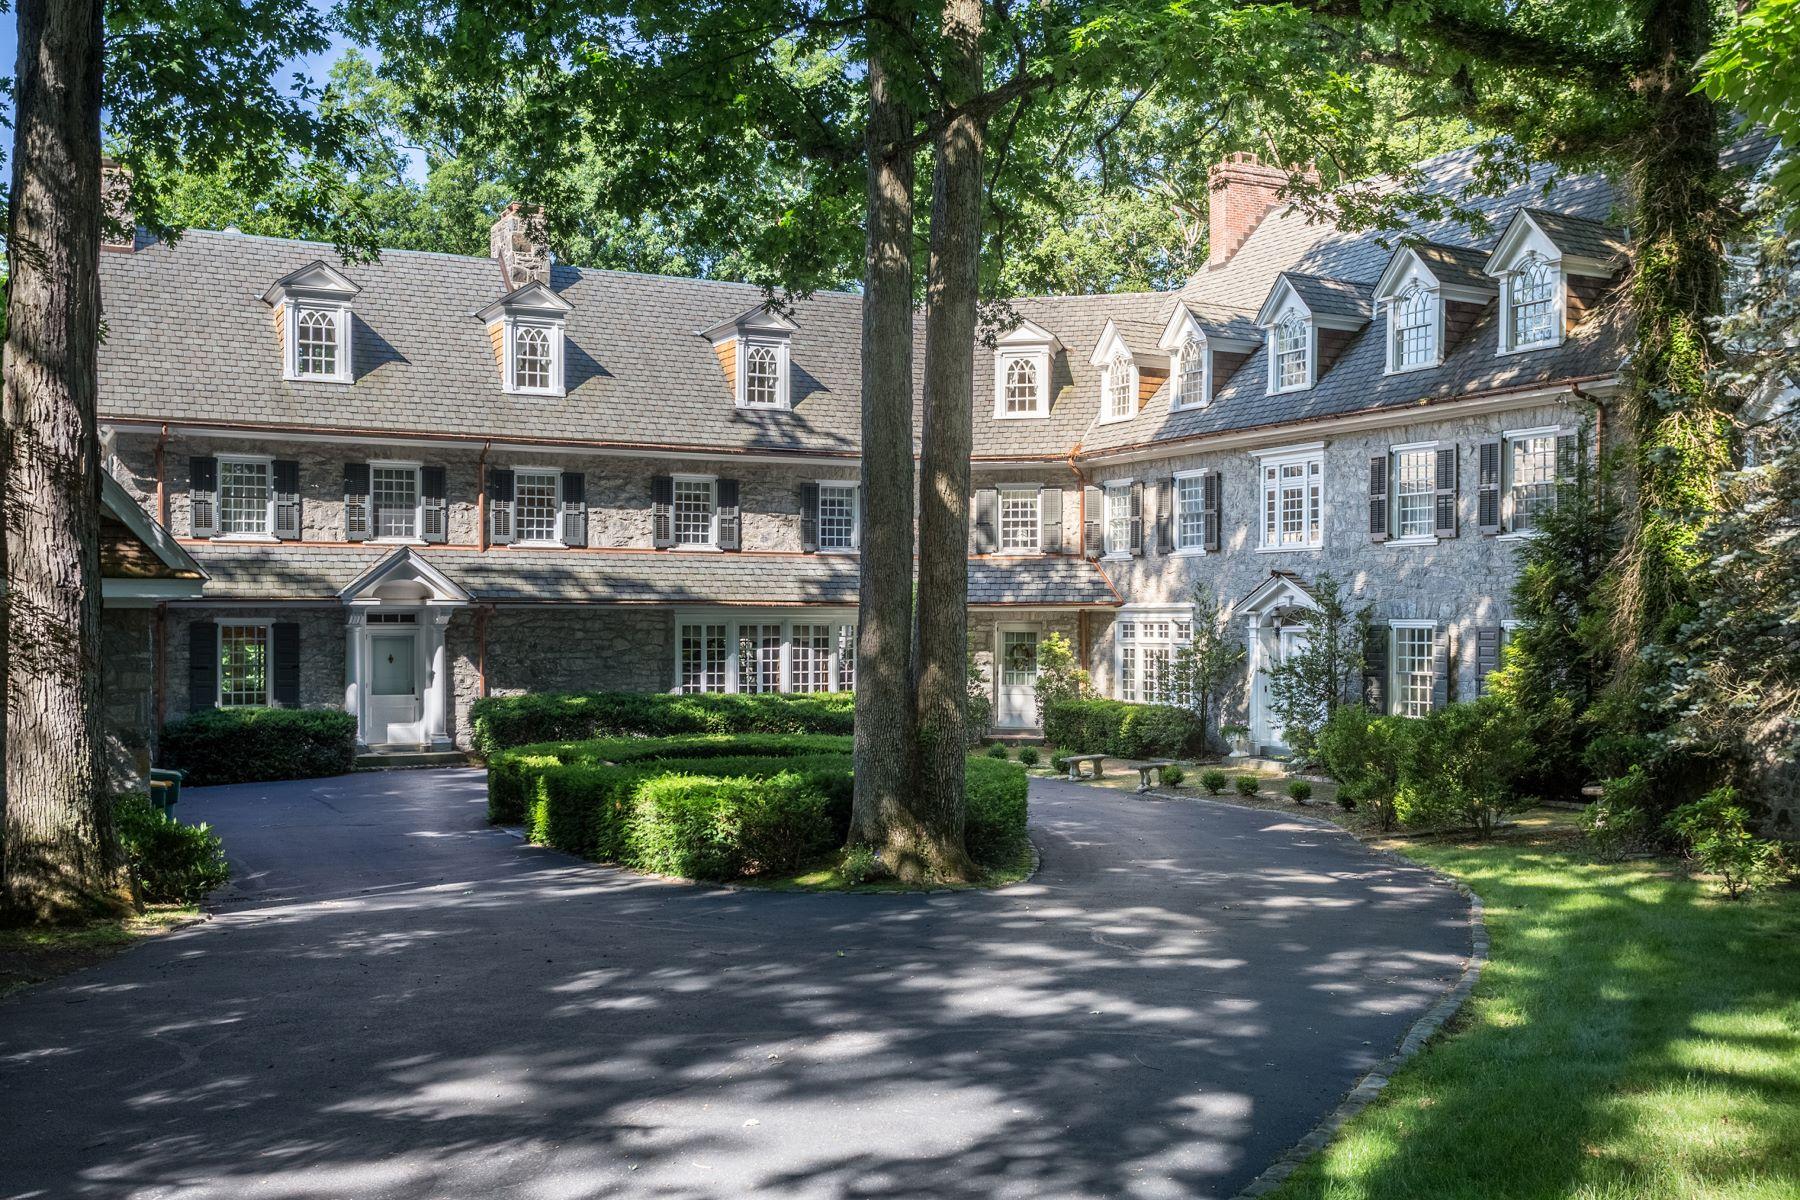 Single Family Home for Sale at 1336 Gypsy Hill Rd 1336 GYPSY HILL RD Gwynedd Valley, Pennsylvania 19002 United States